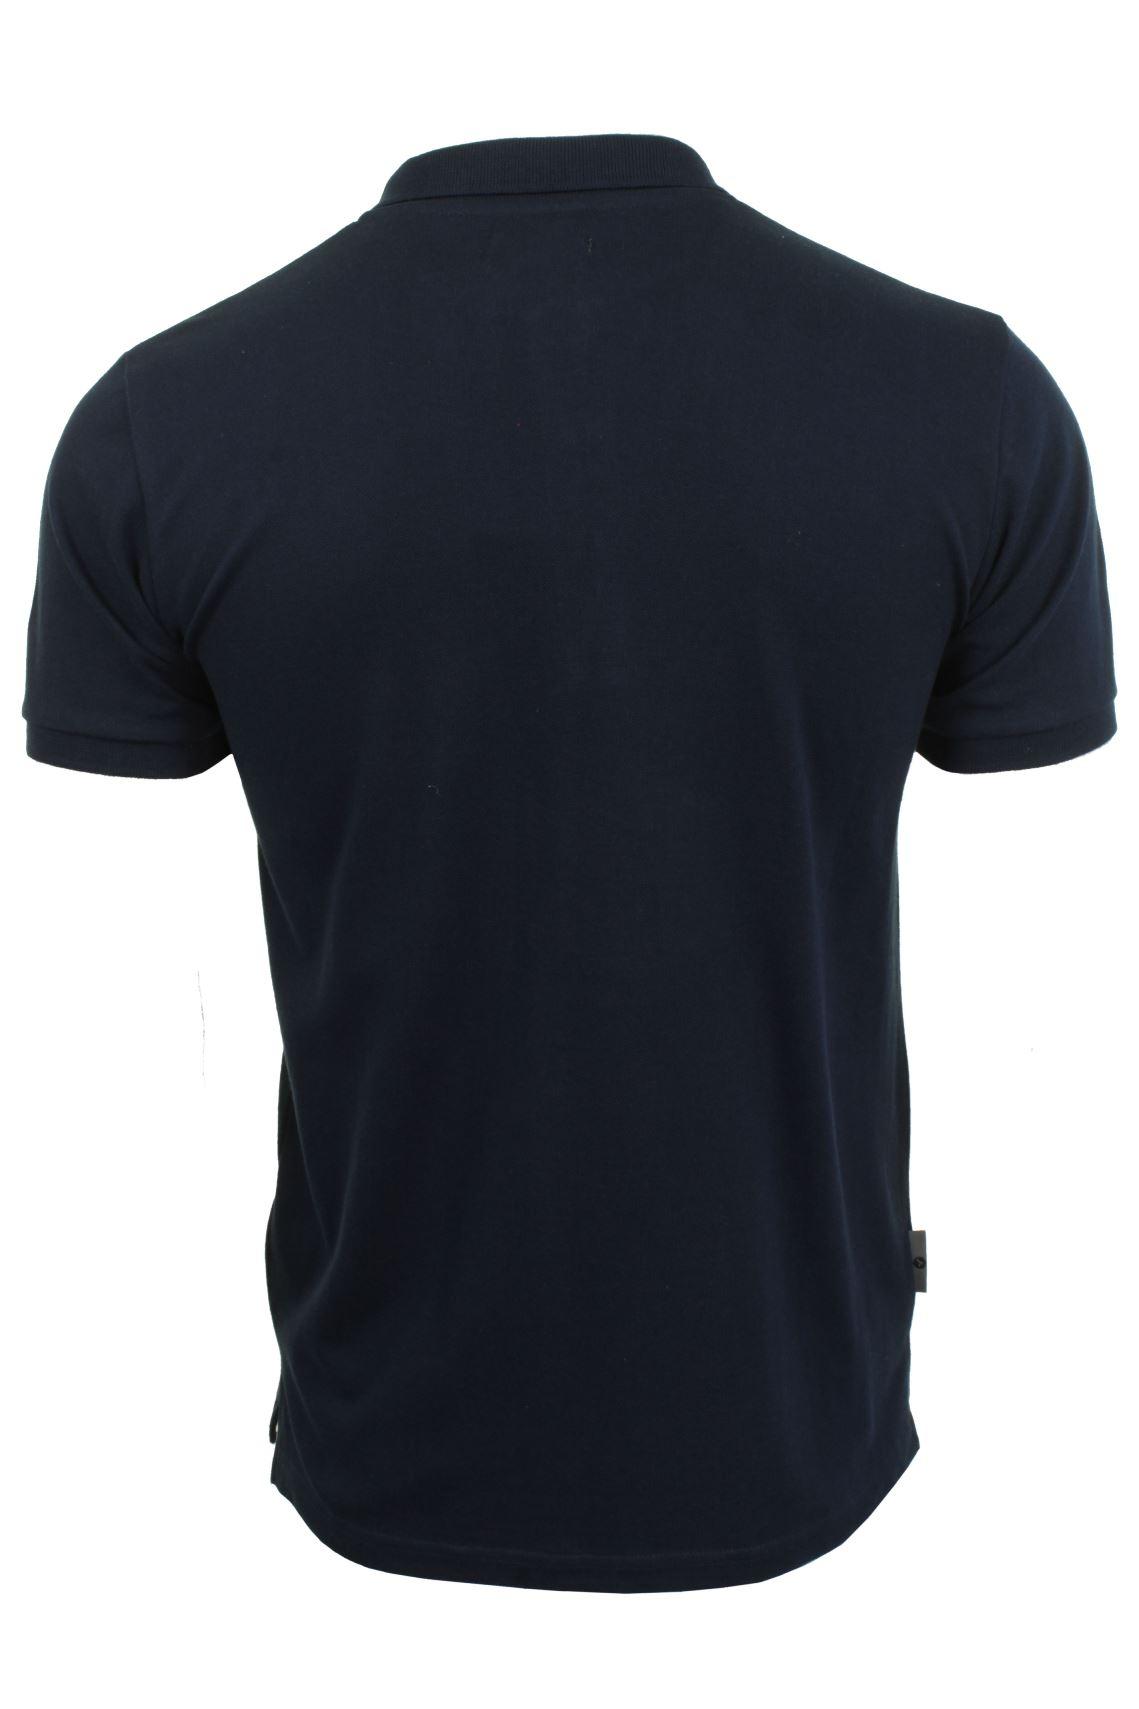 Camisa-Polo-para-hombre-Voi-Jeans-Redford-de-manga-corta-de-moda miniatura 5